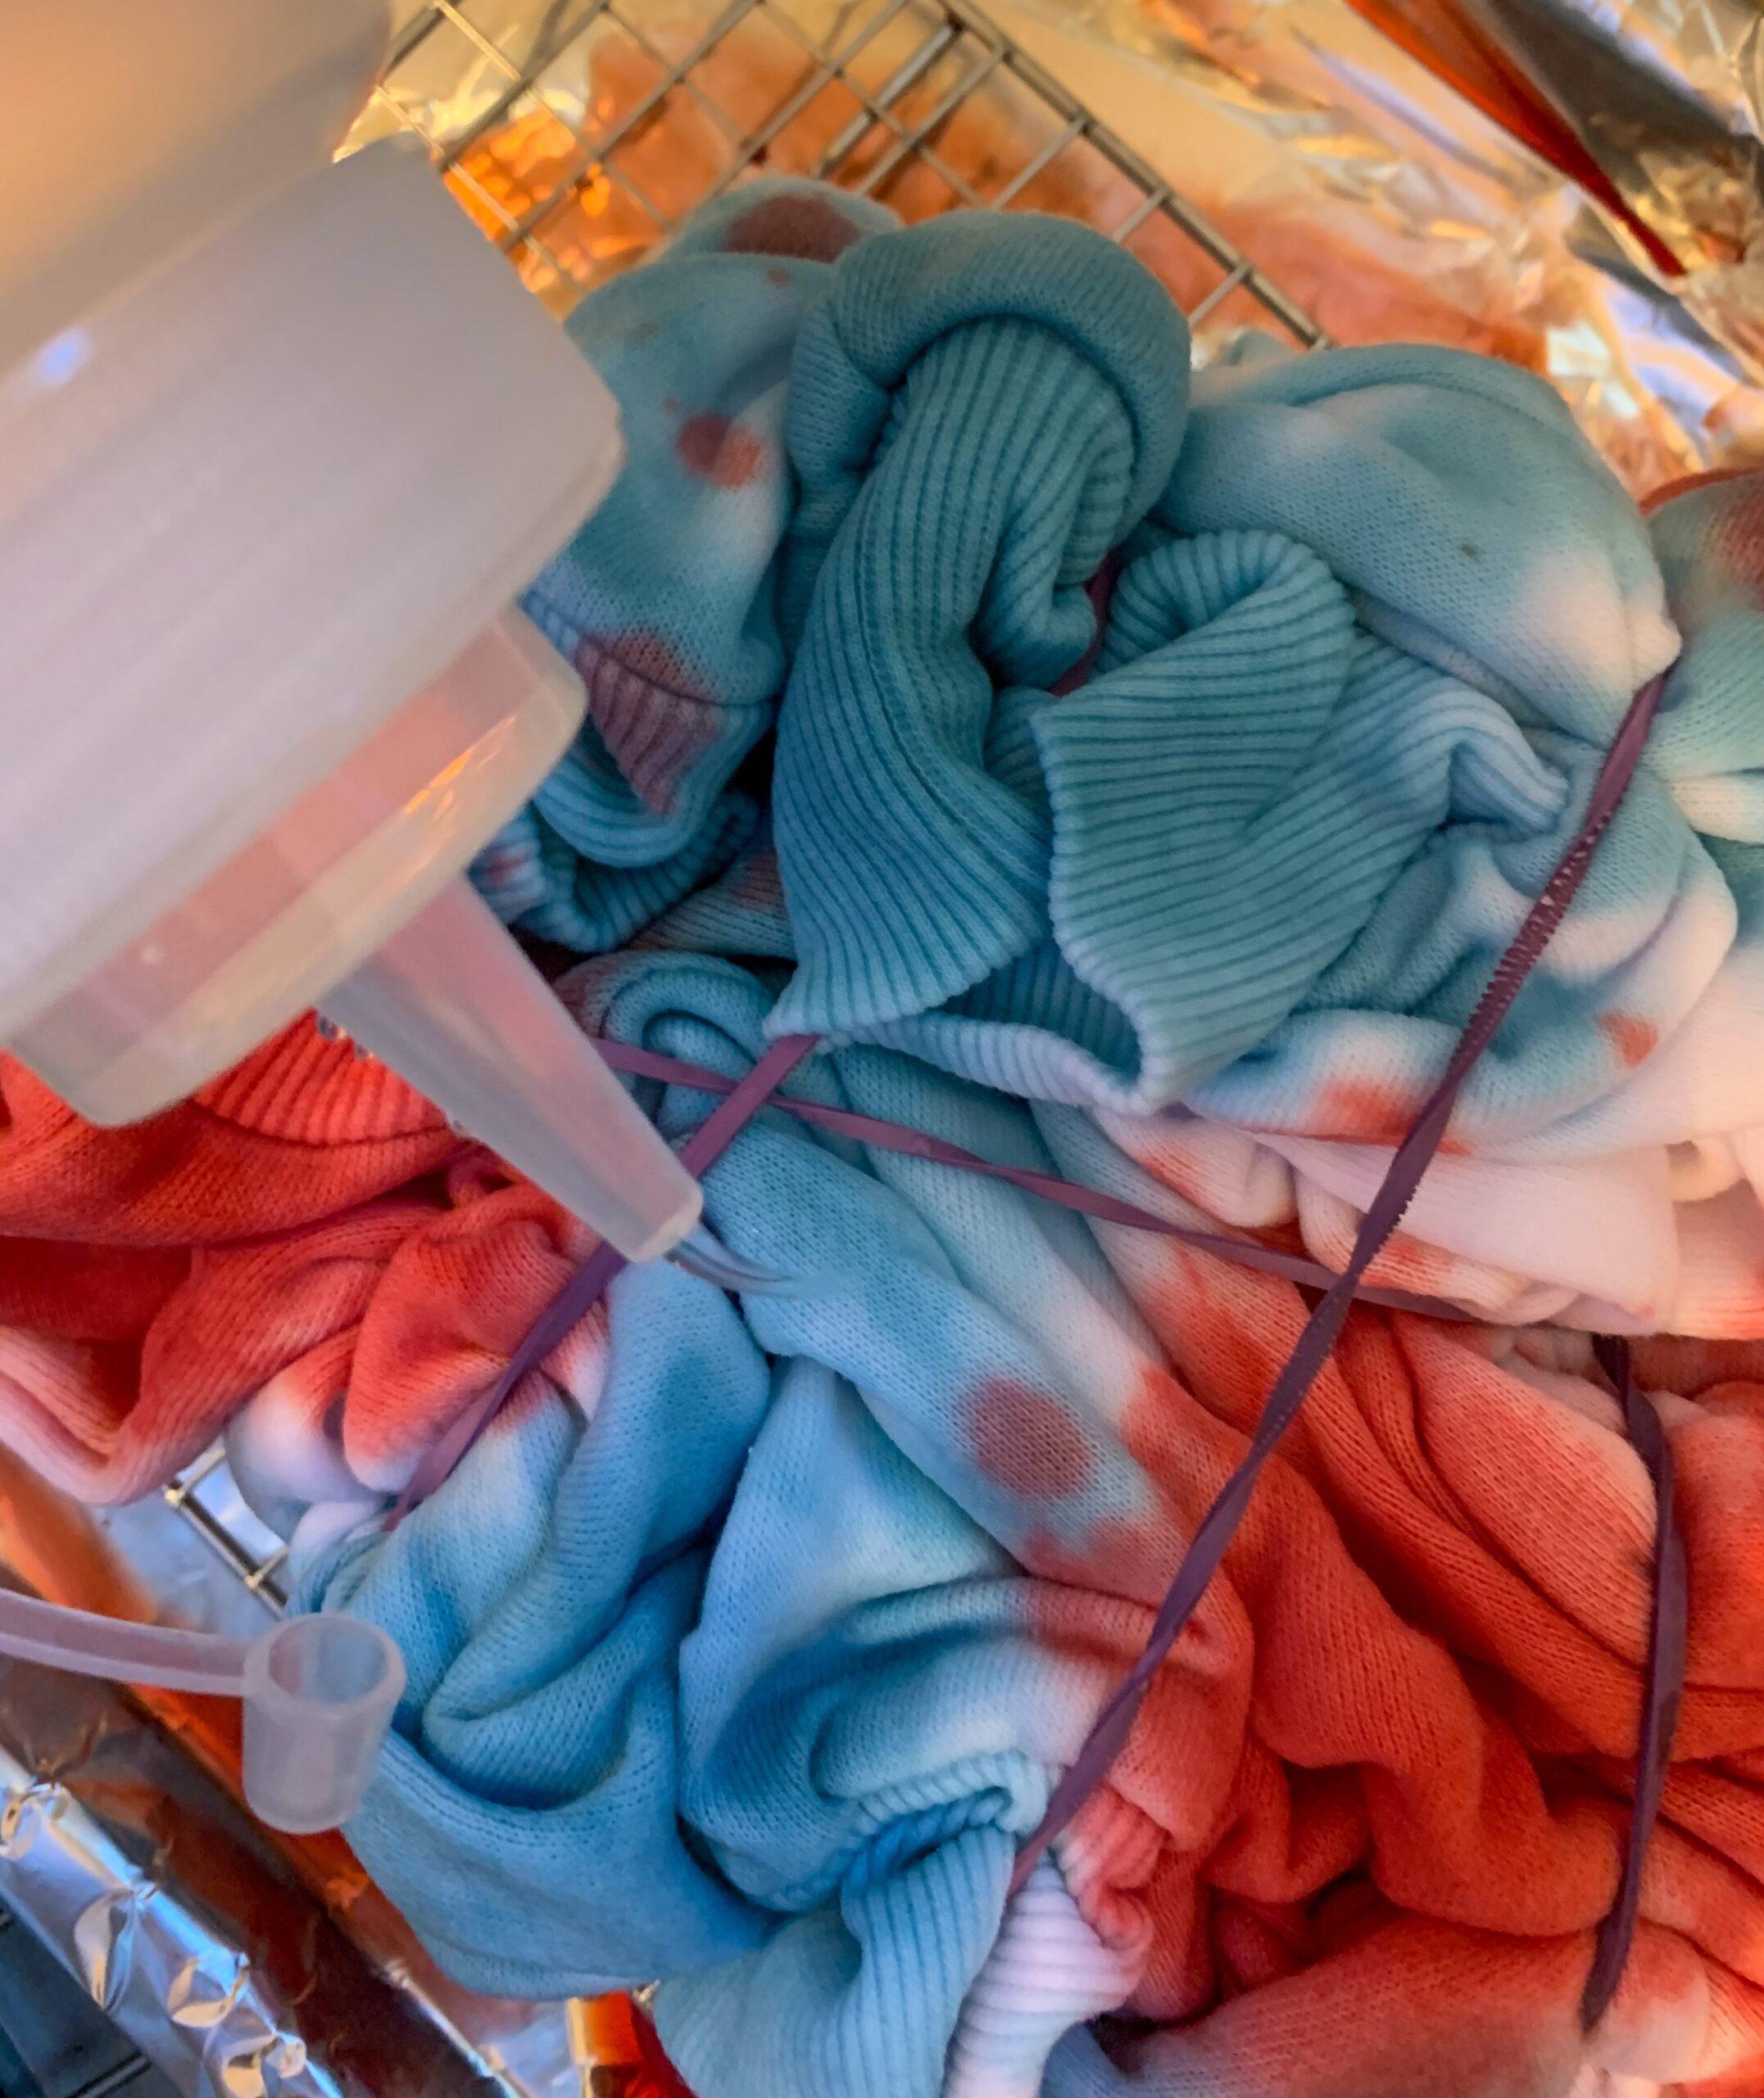 covering shirt in dye fixative